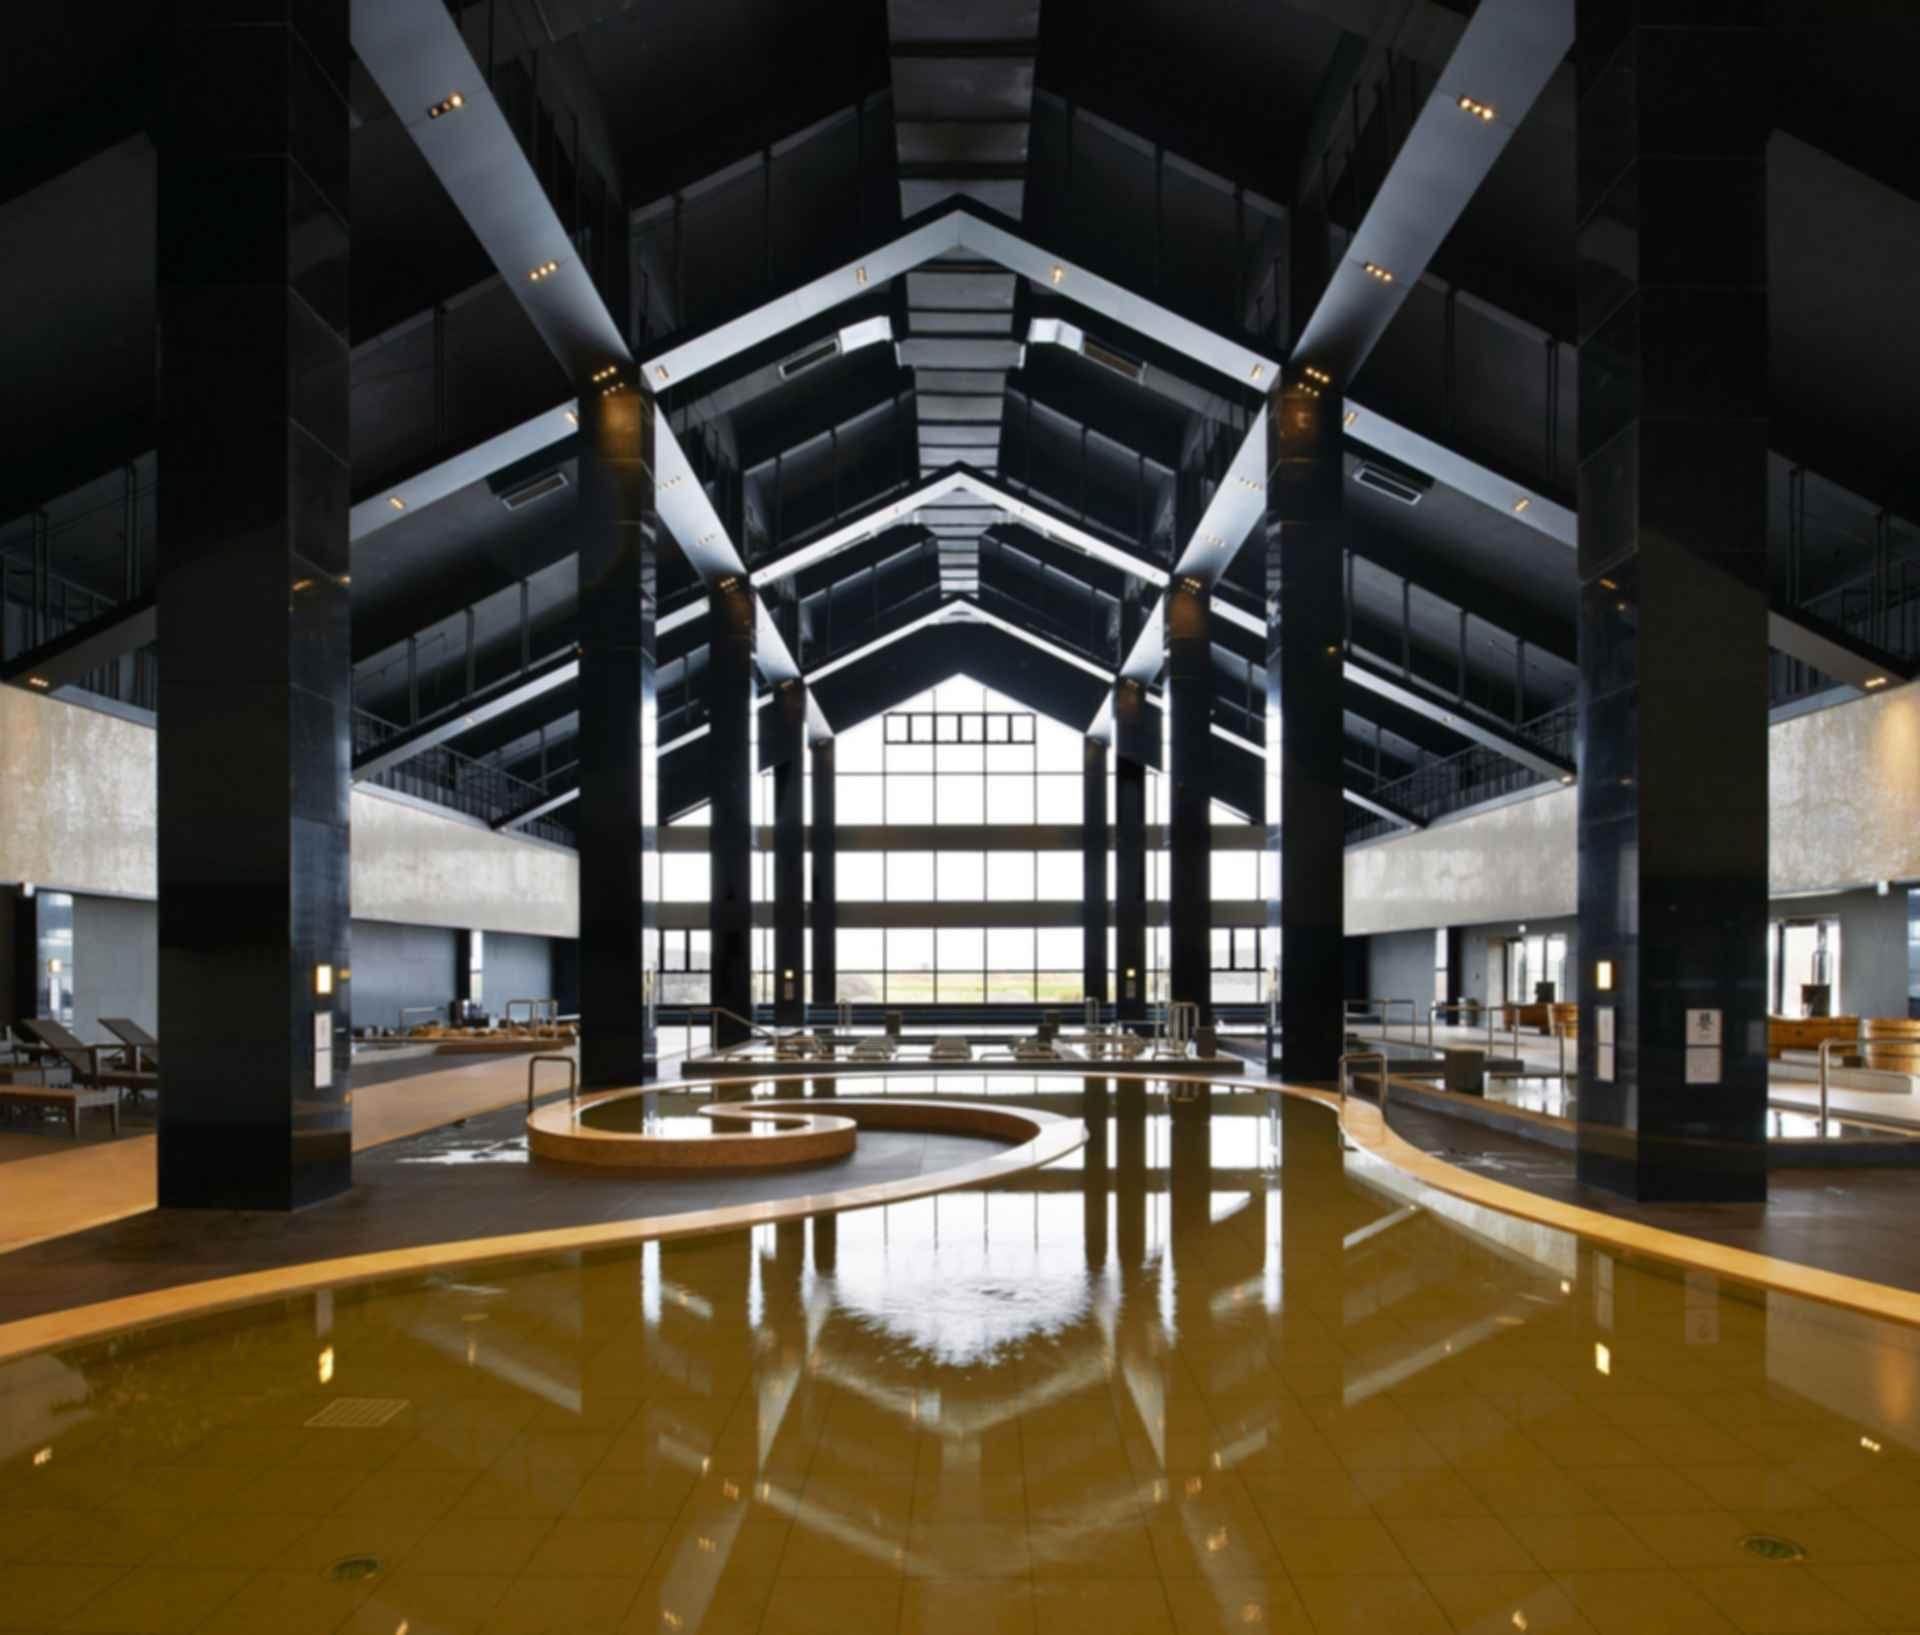 Qiqihaer Hezhitang Hot Spring - Interior/Pool